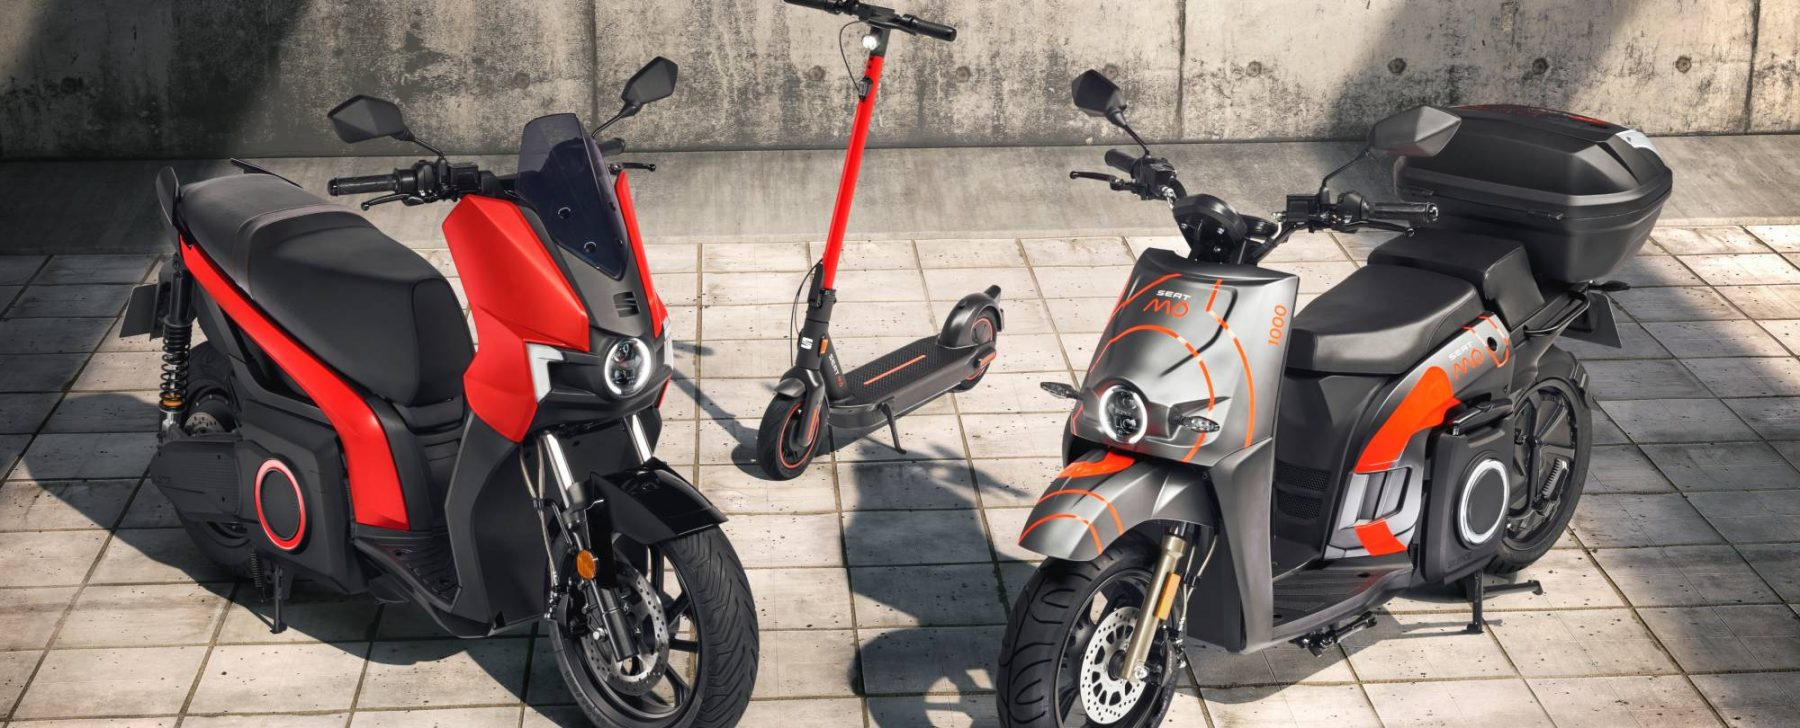 Moto electrica Seat